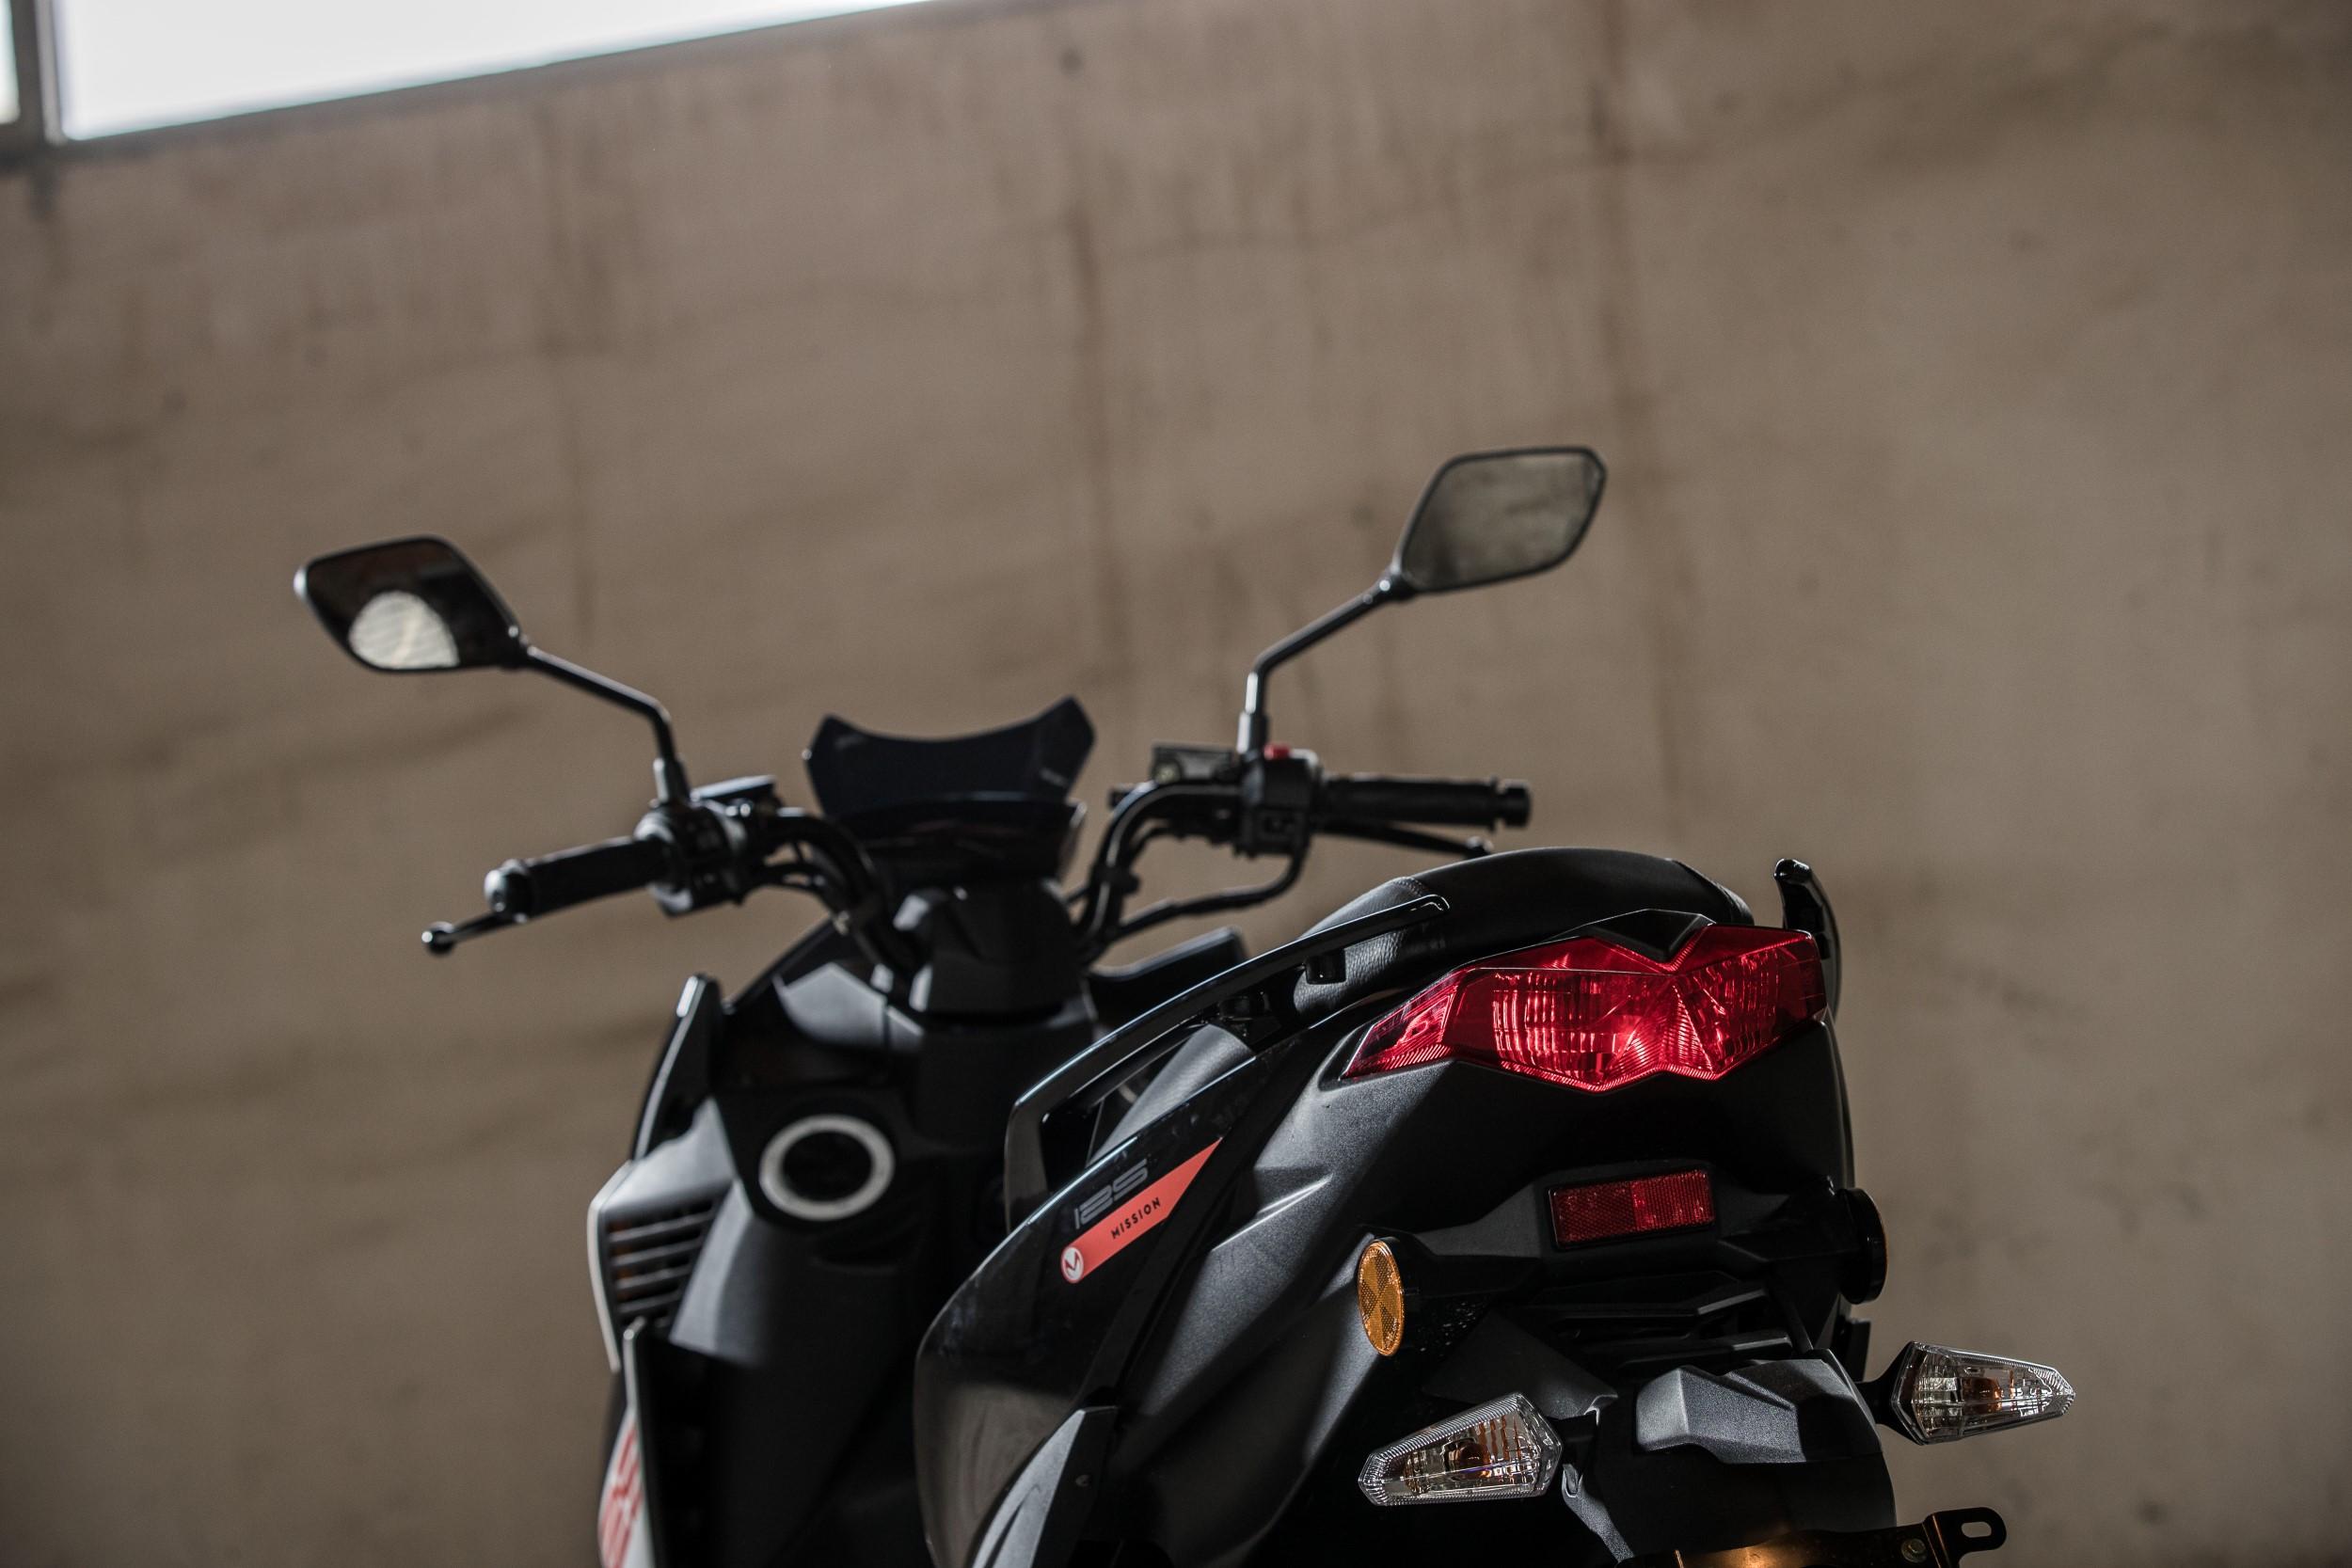 https://malaguti.bike/wp-content/uploads/sites/3/2021/04/AE9I2218-smaller.jpg